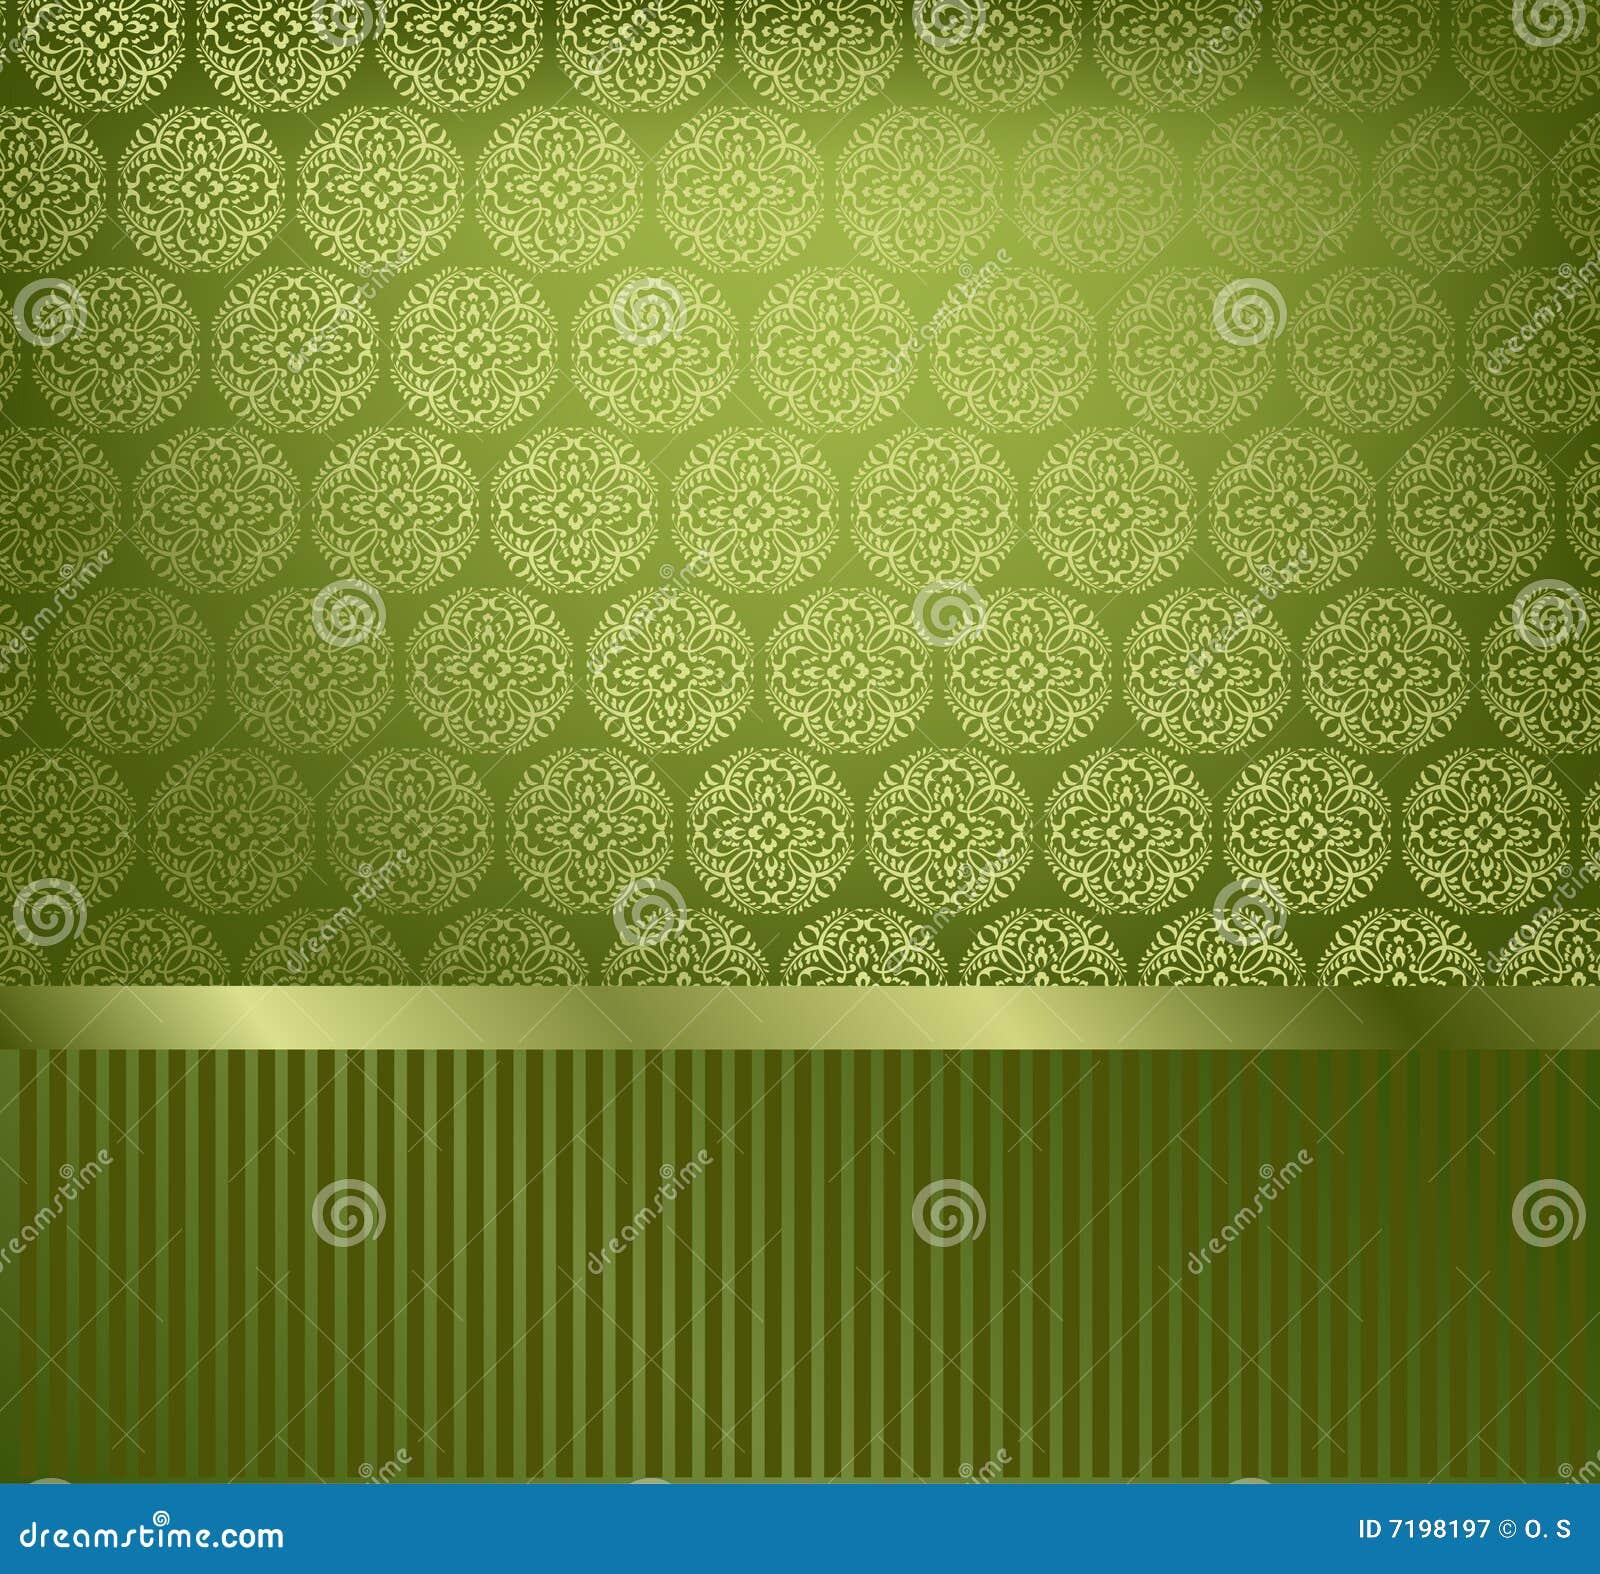 Decorative Wall Paper wallpaper black royalty free stock photos - image: 8256718